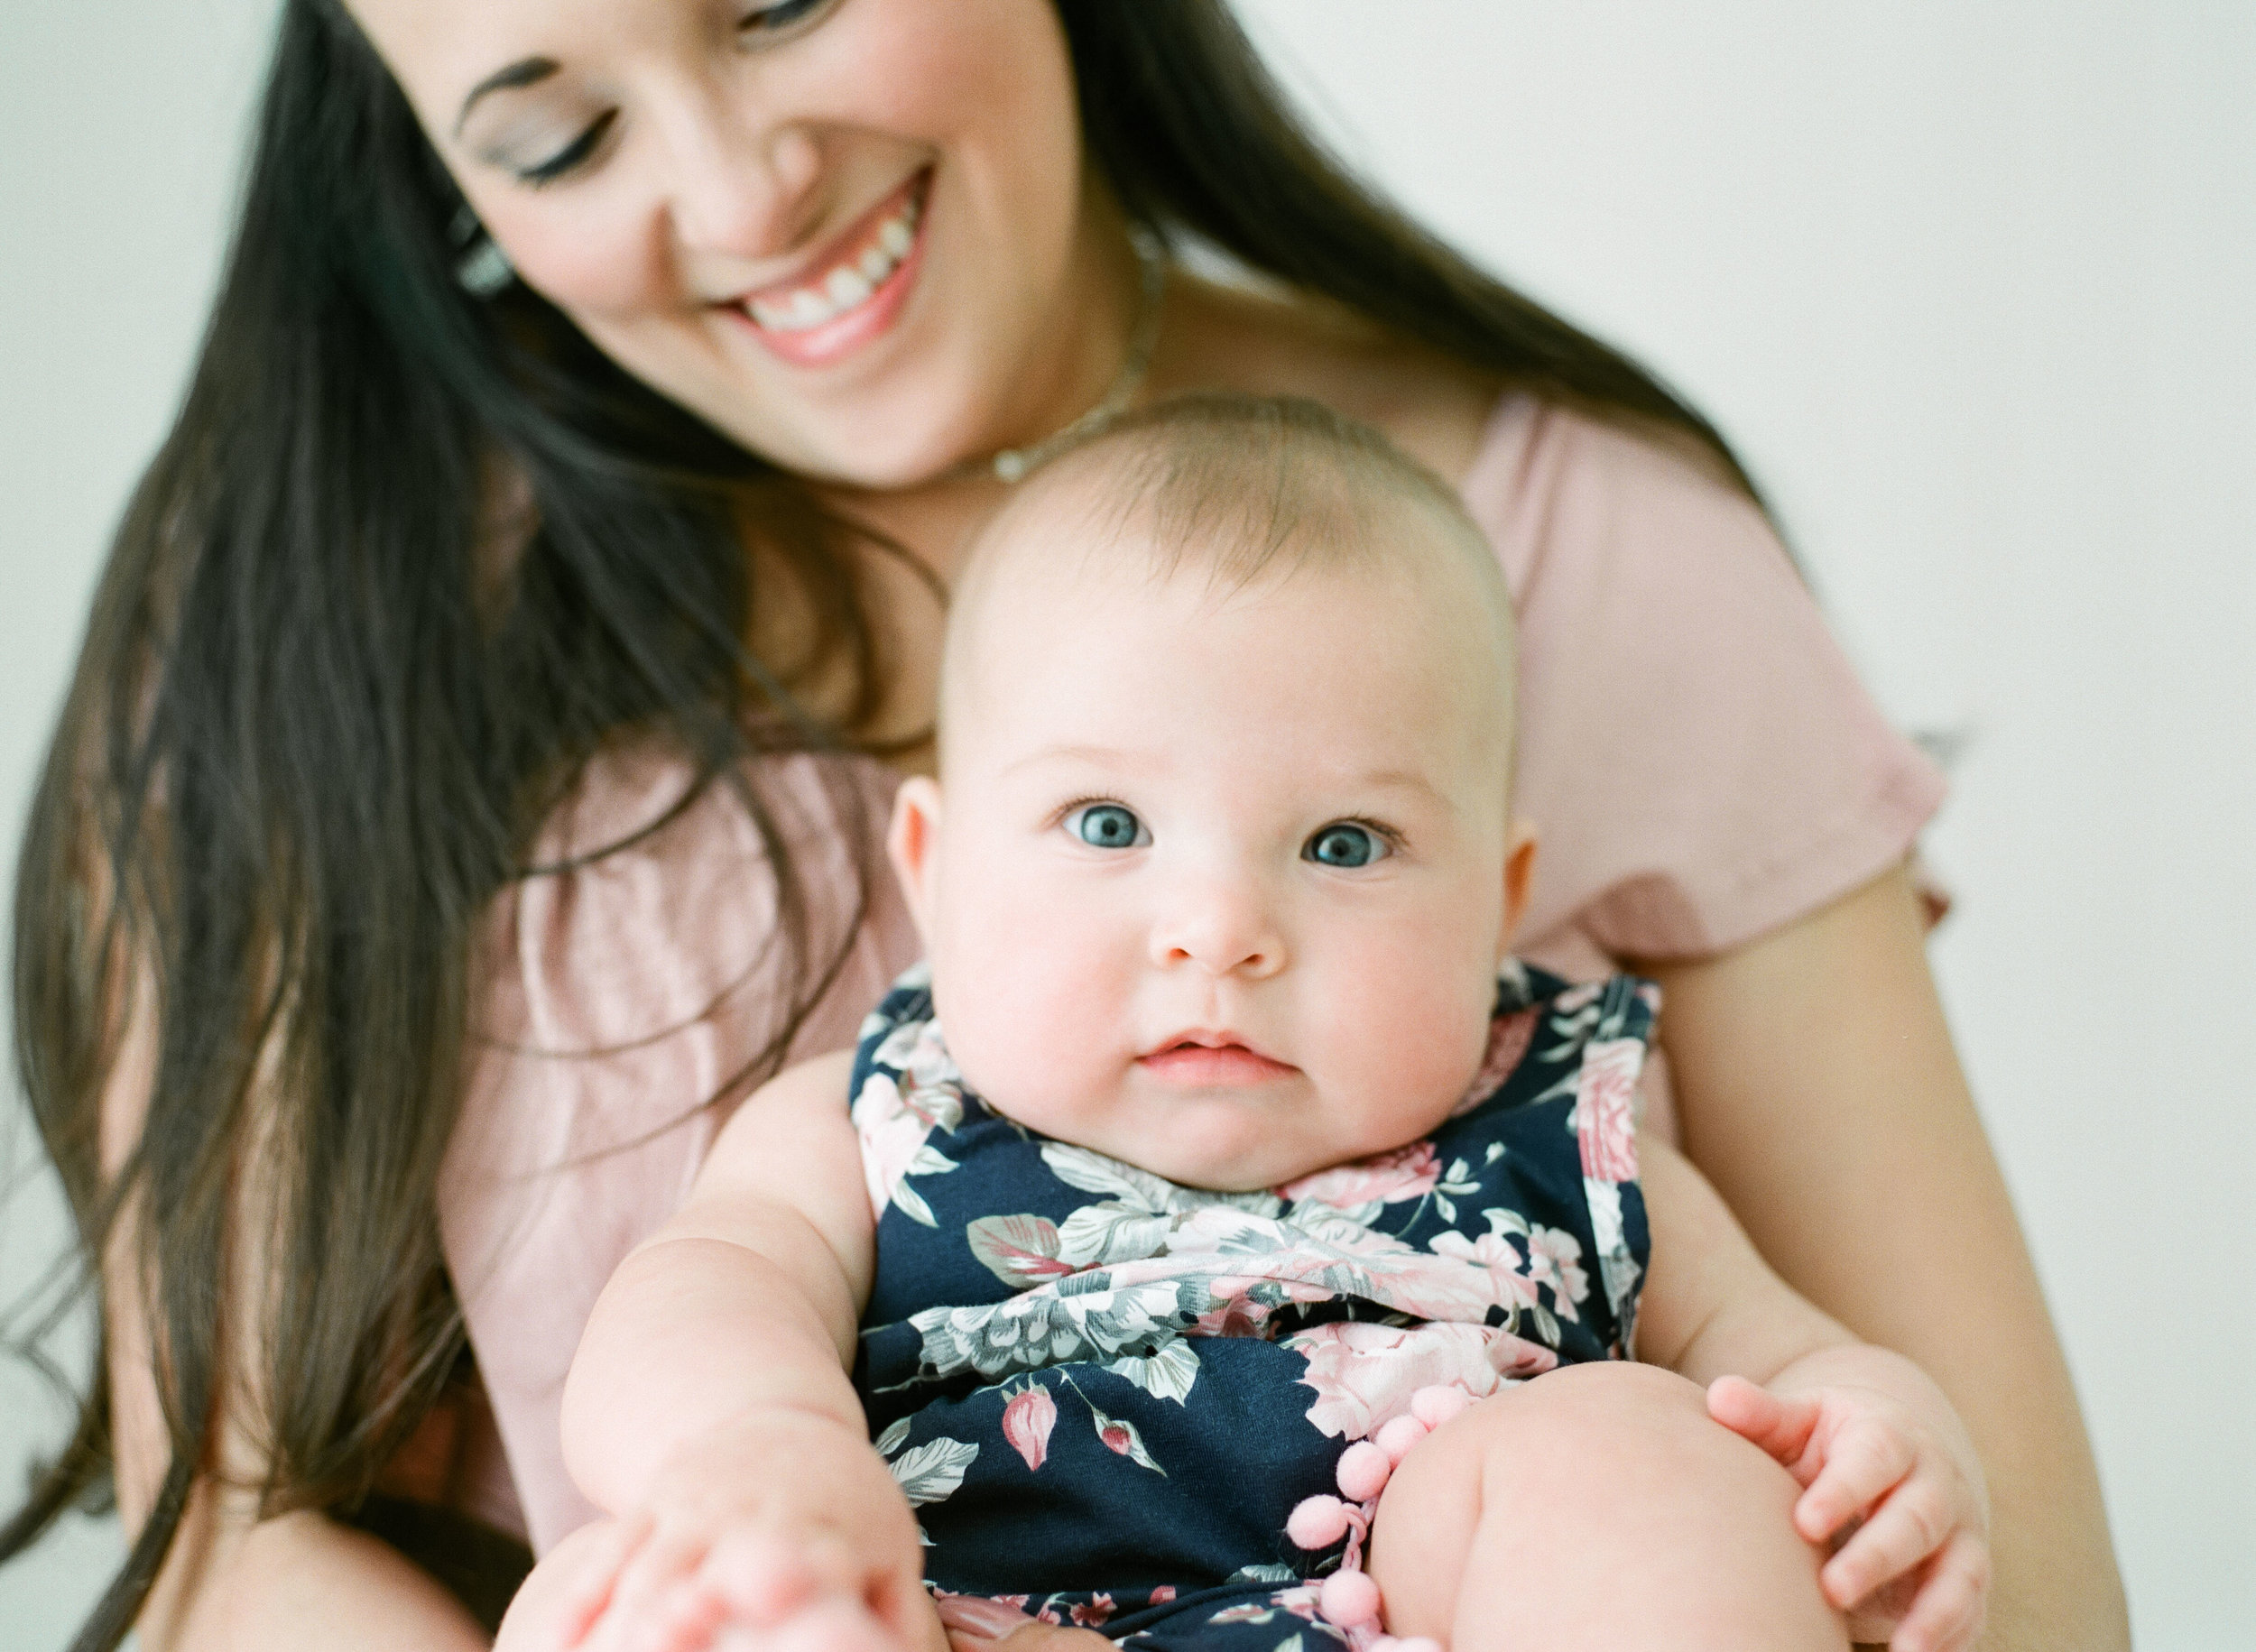 wake-forest-baby-photographer-studio-raleigh-childhood-001